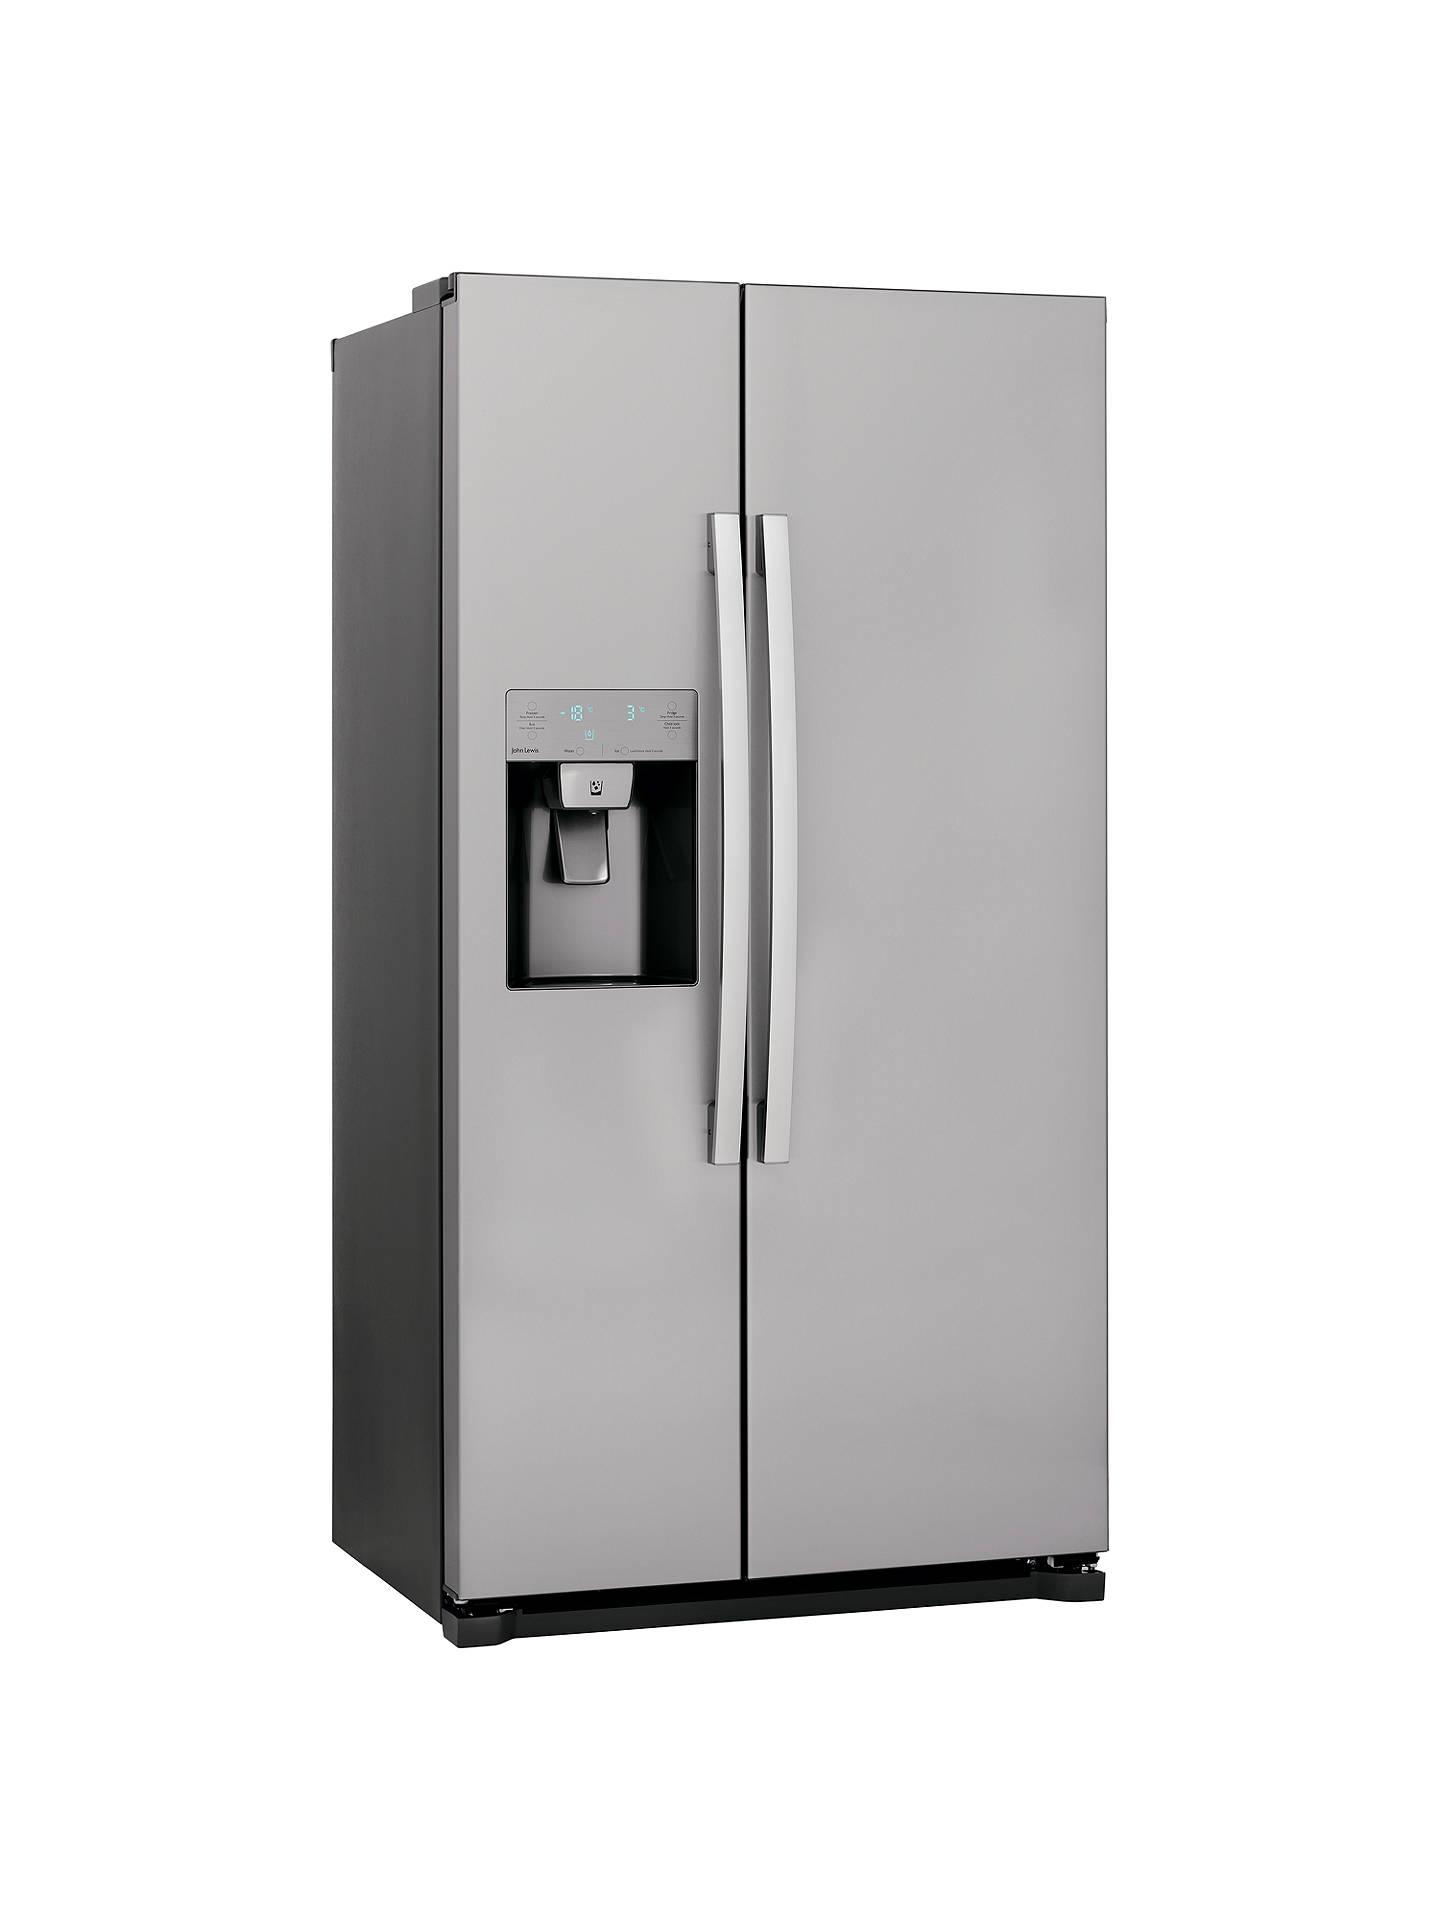 john lewis jlaffss2016 american style fridge freezer a. Black Bedroom Furniture Sets. Home Design Ideas